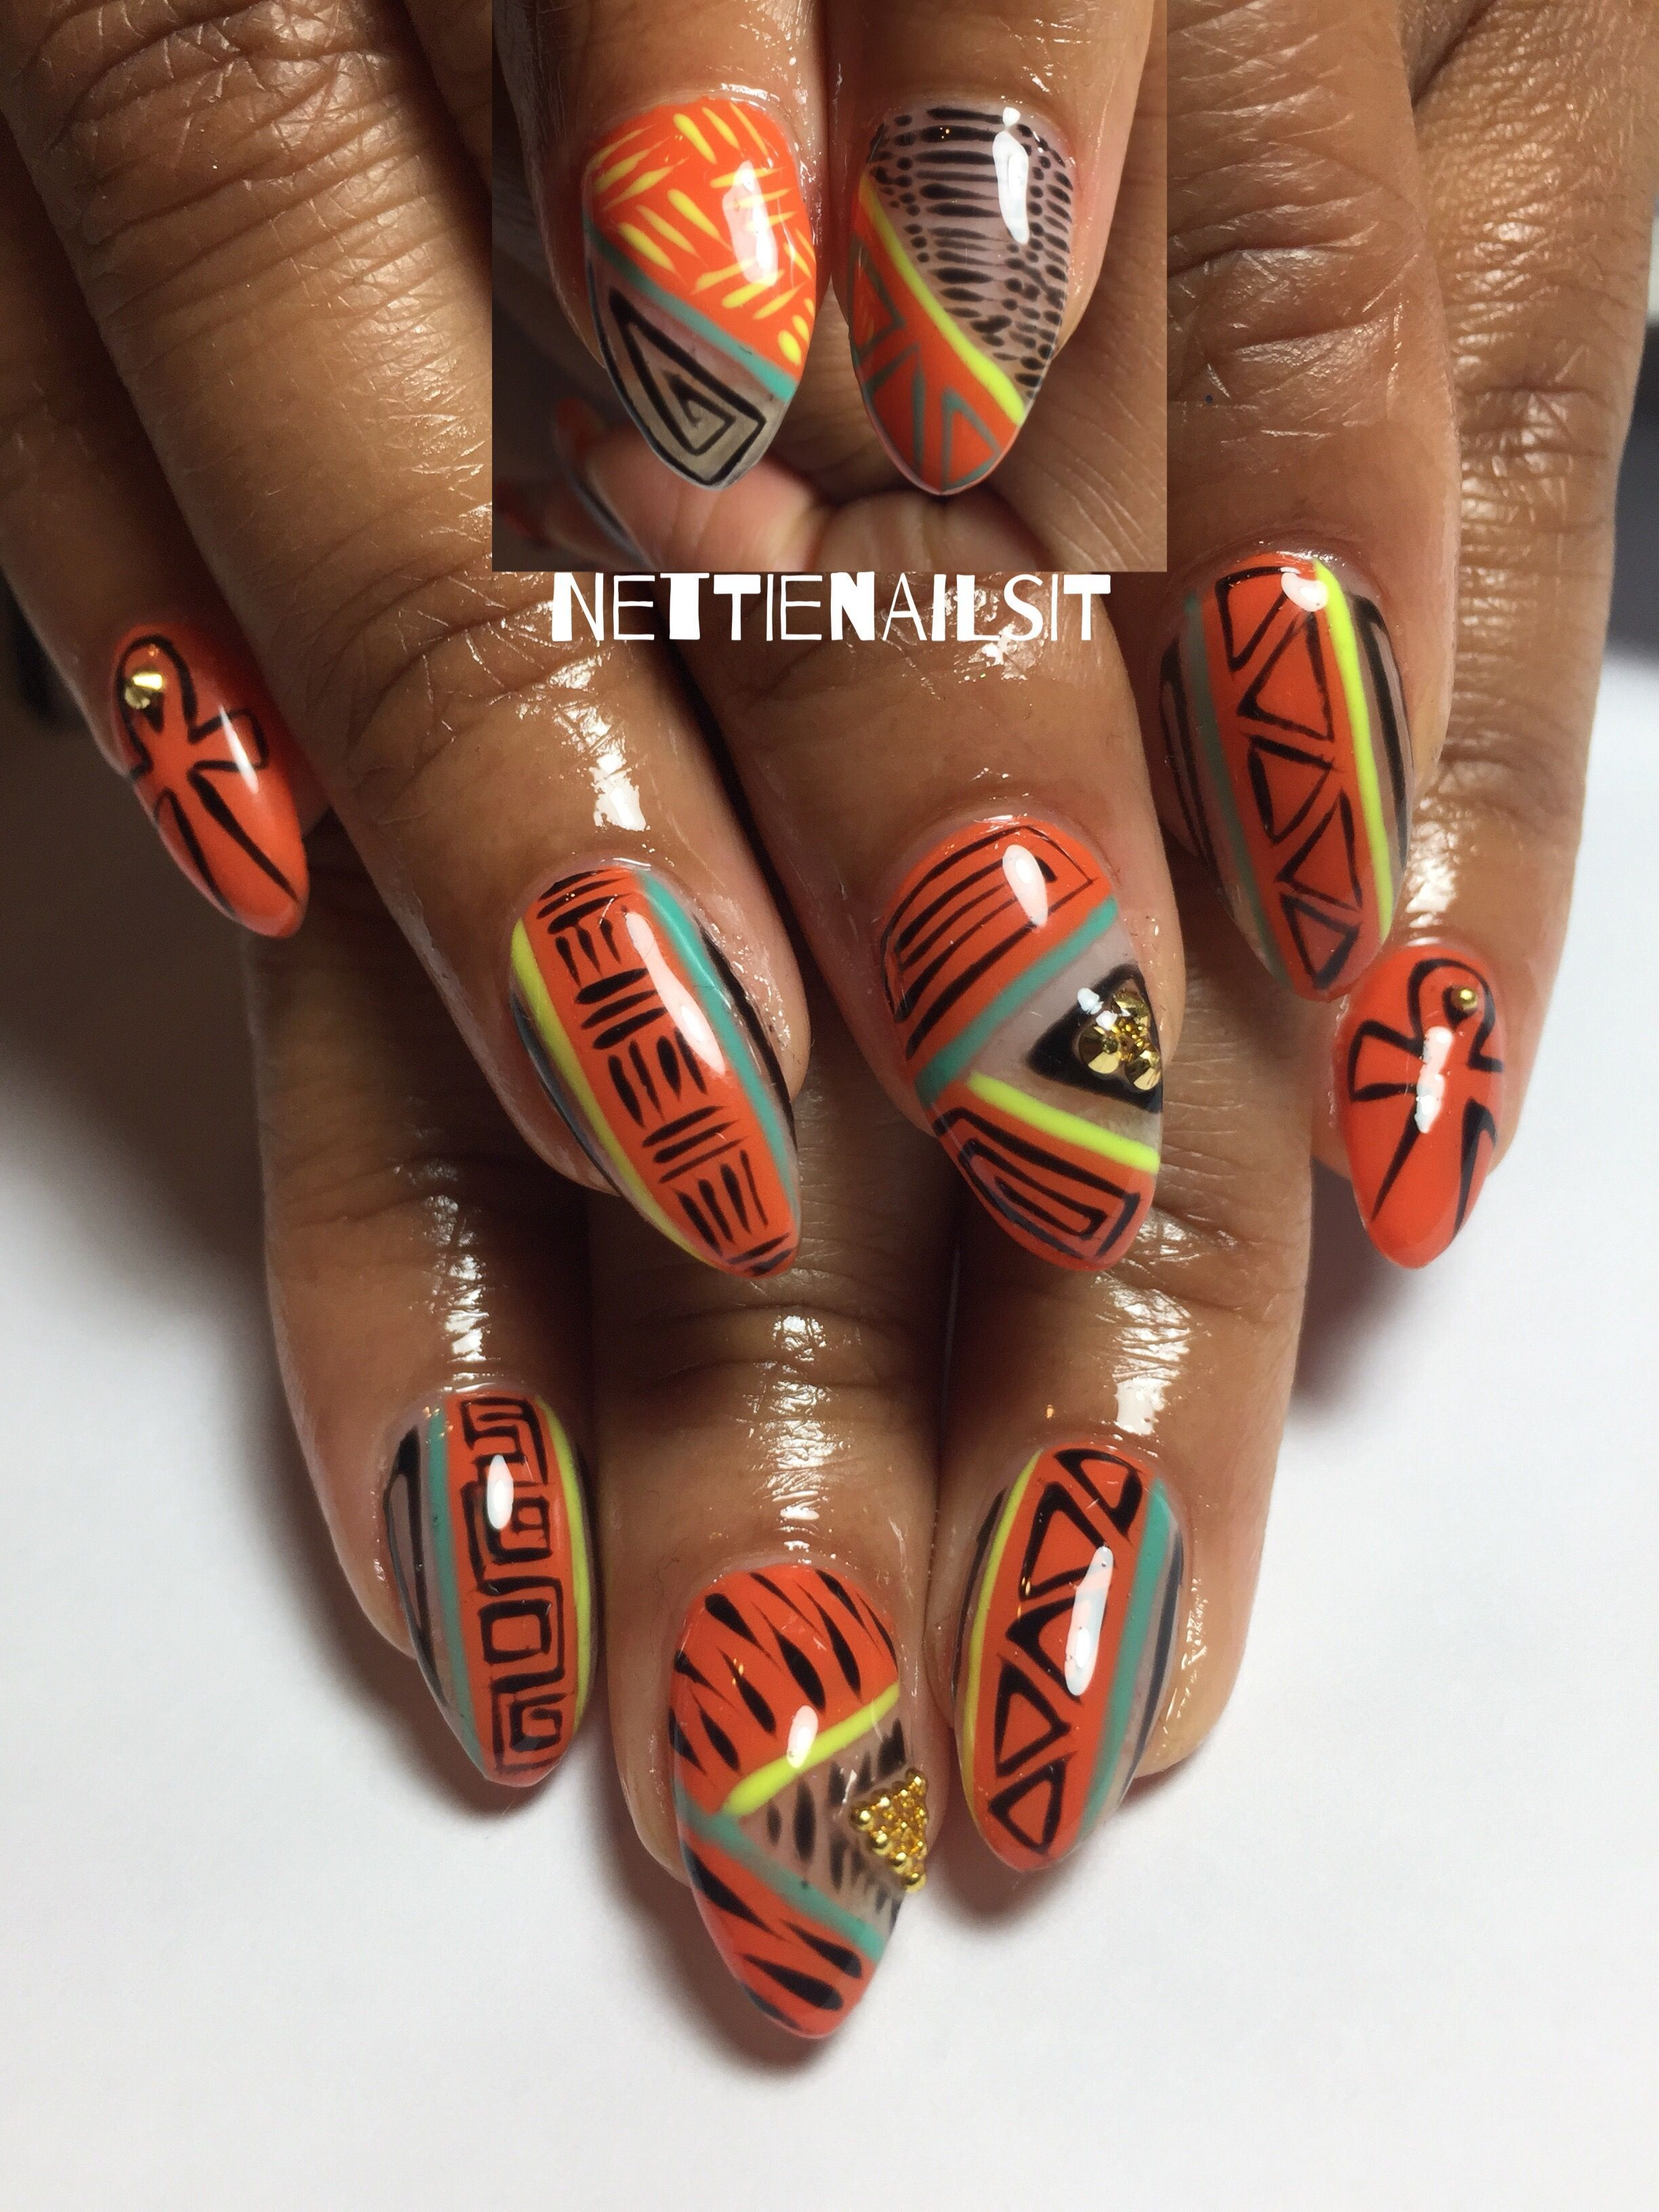 Rasta Nails Design : rasta, nails, design, African, November, Nails,, Designs,, Rasta, Nails